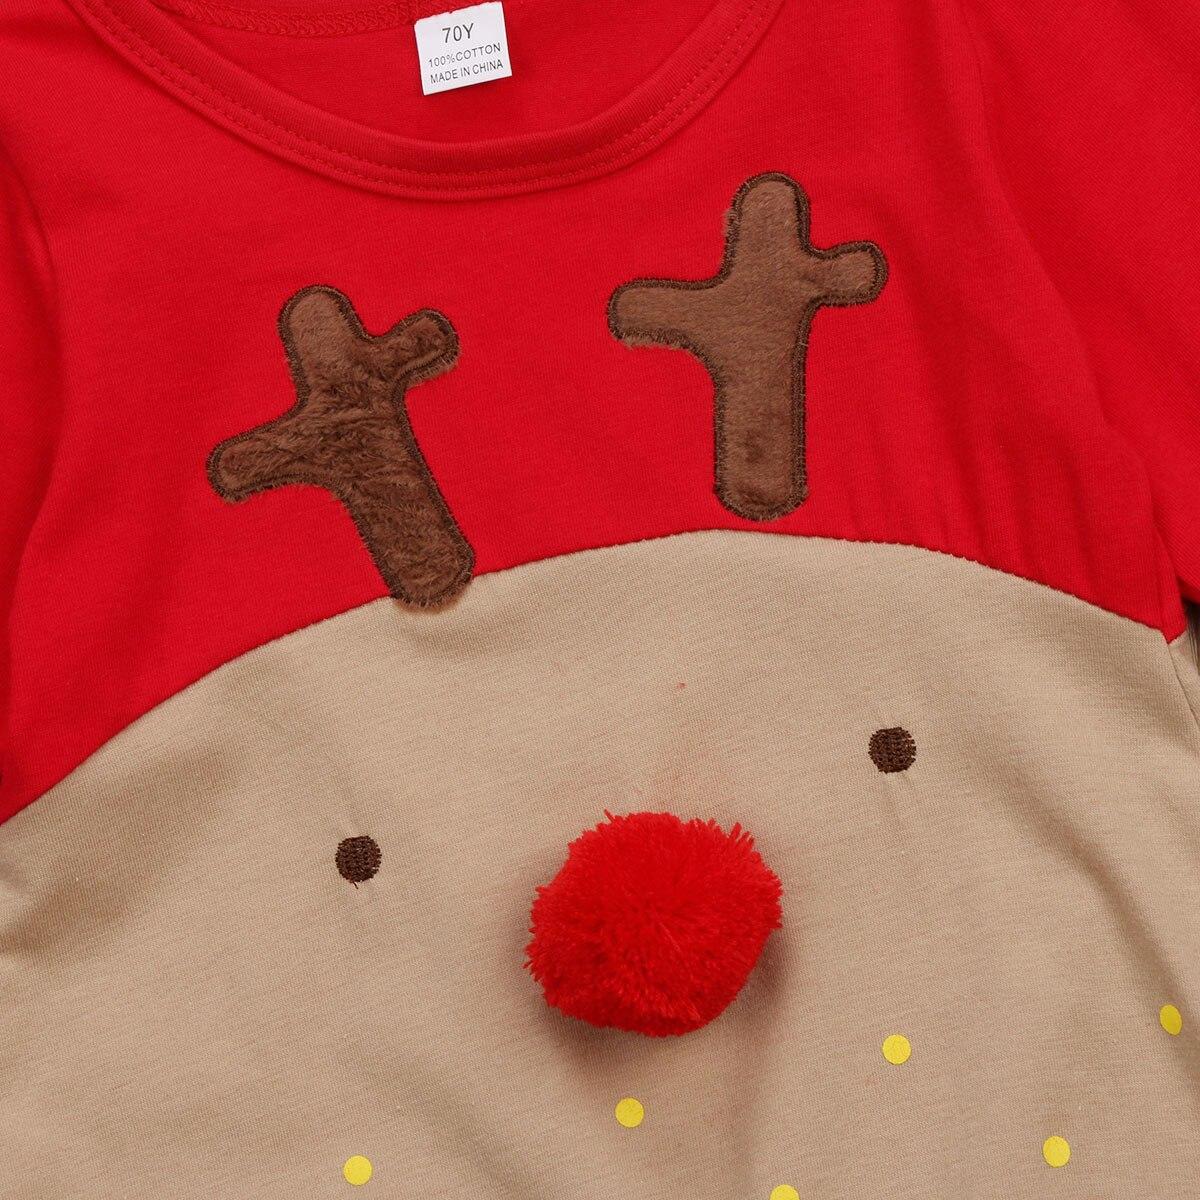 2Pcs Newborn Baby Boys Girl Christmas Rompers Long Sleeve Deer Romper Jumpsuit Hat Sleepwear Party Costume Baby Clothes